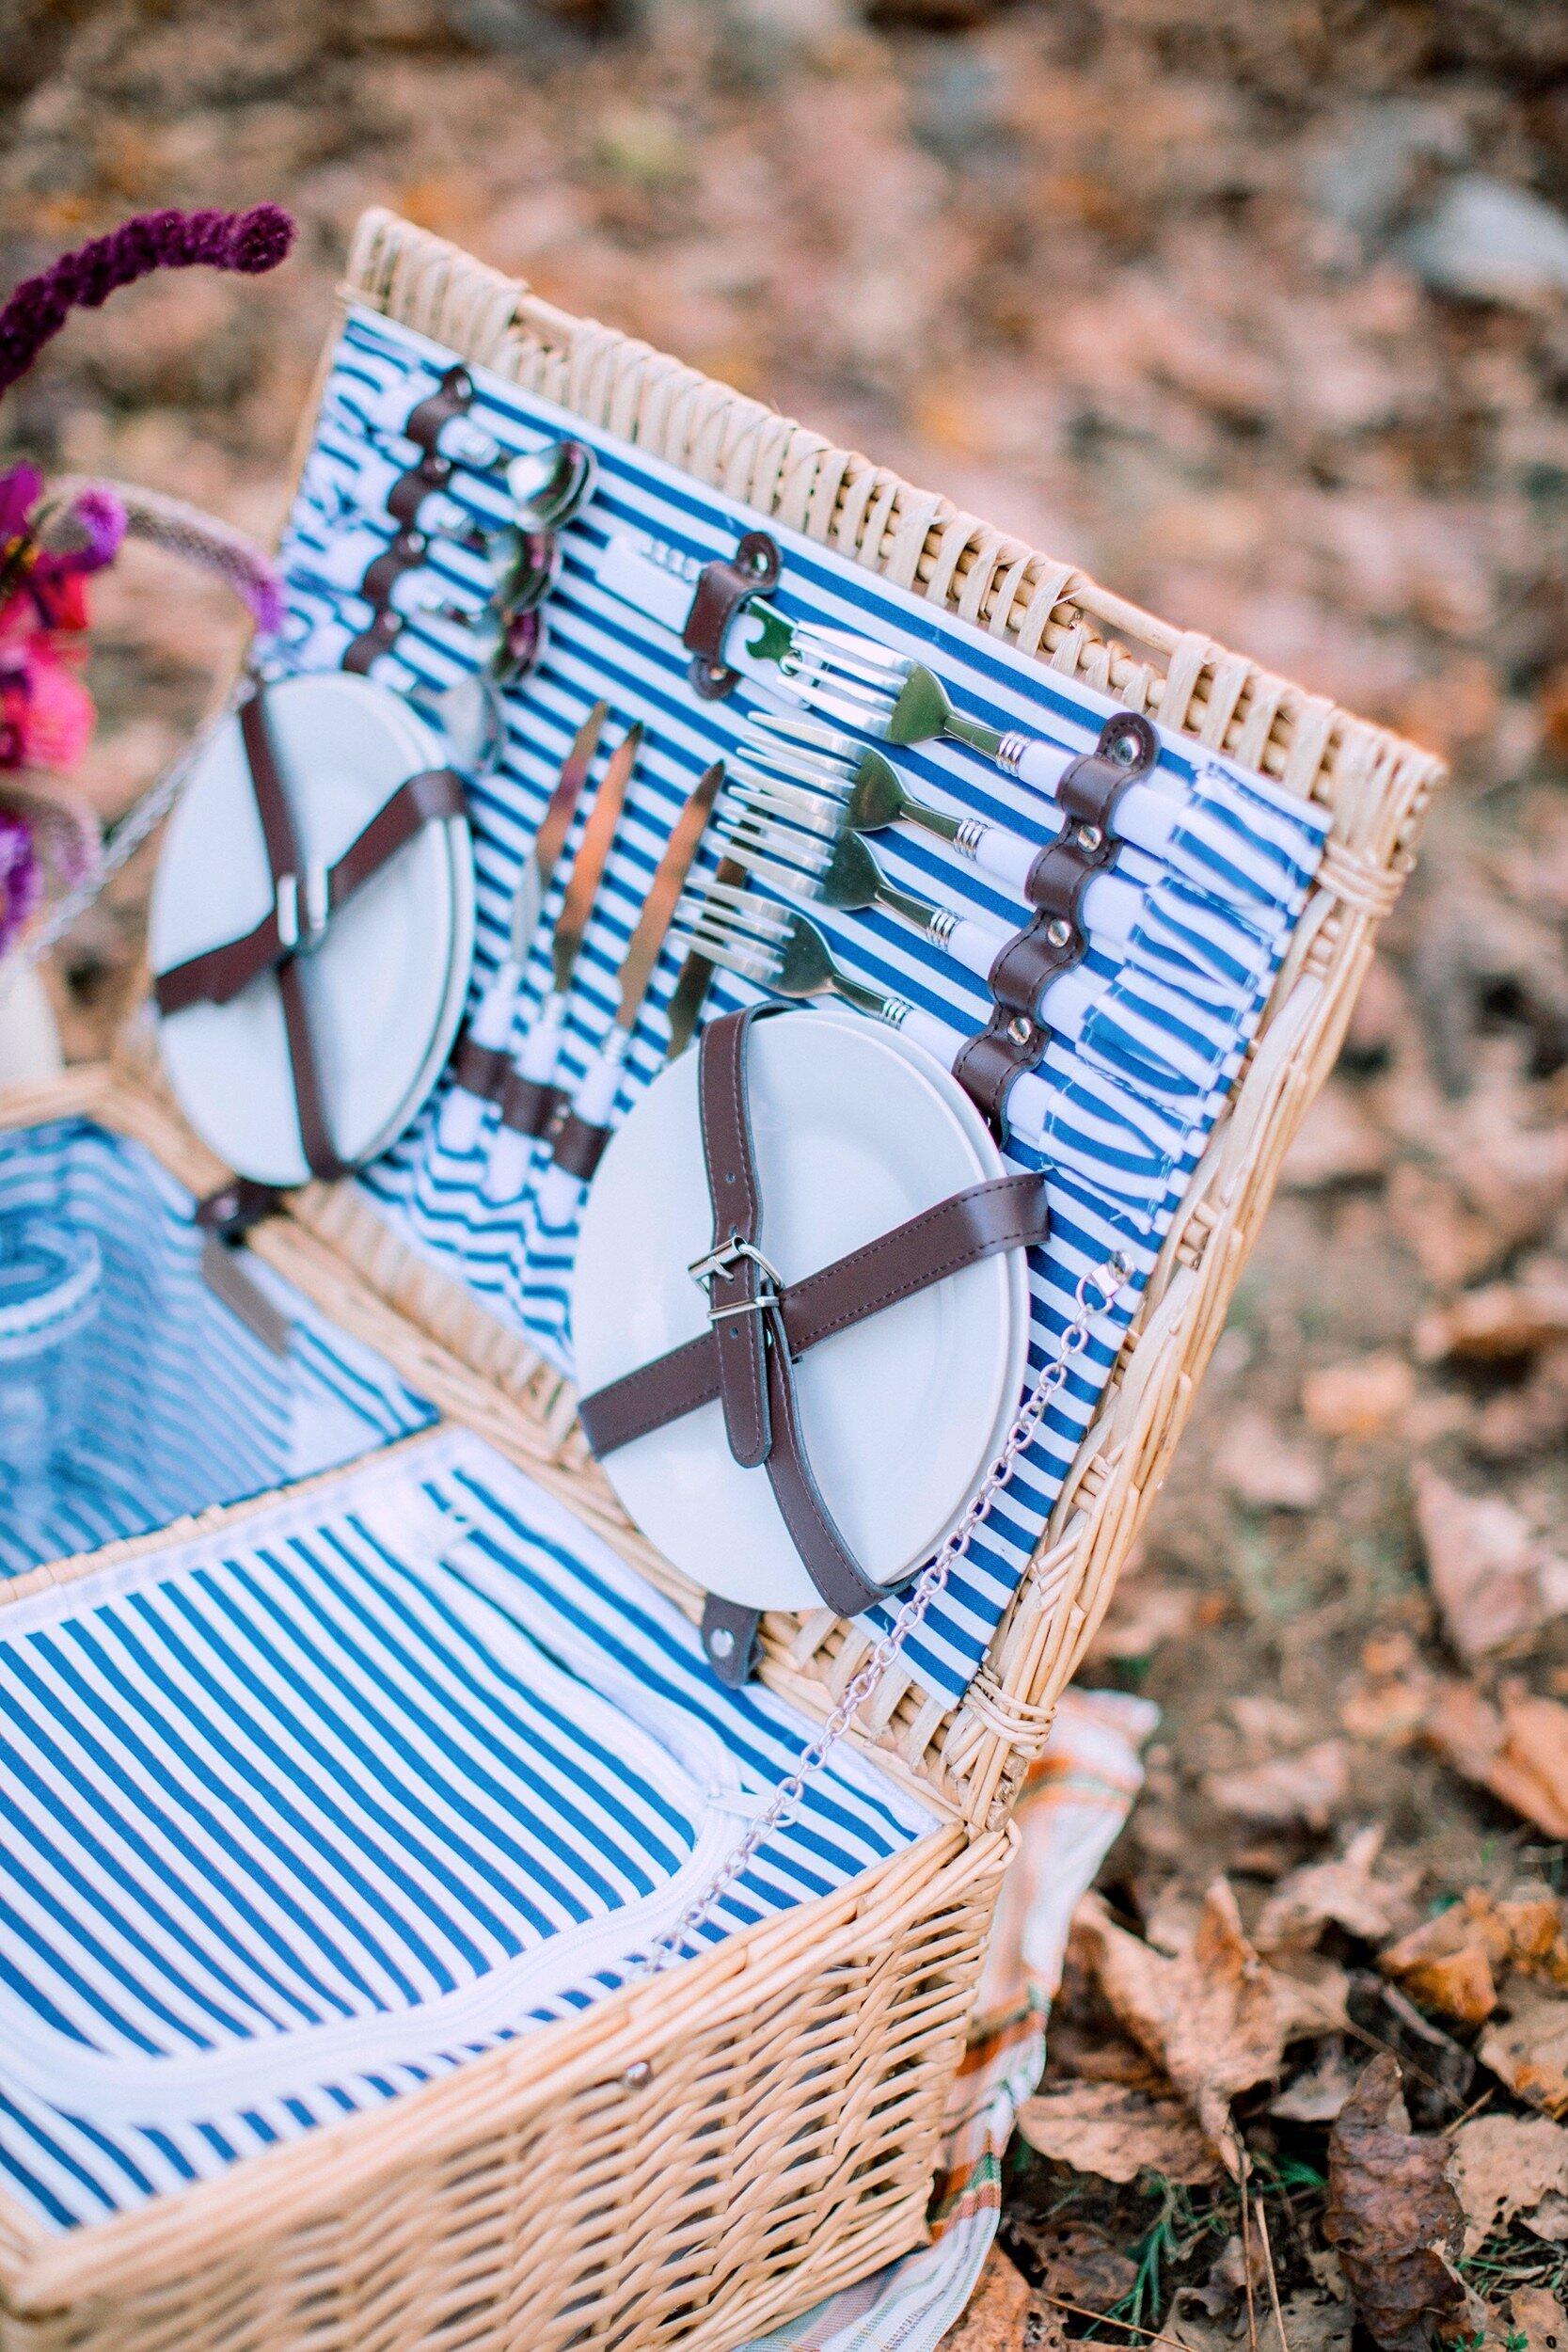 belmont picnic basket.JPG